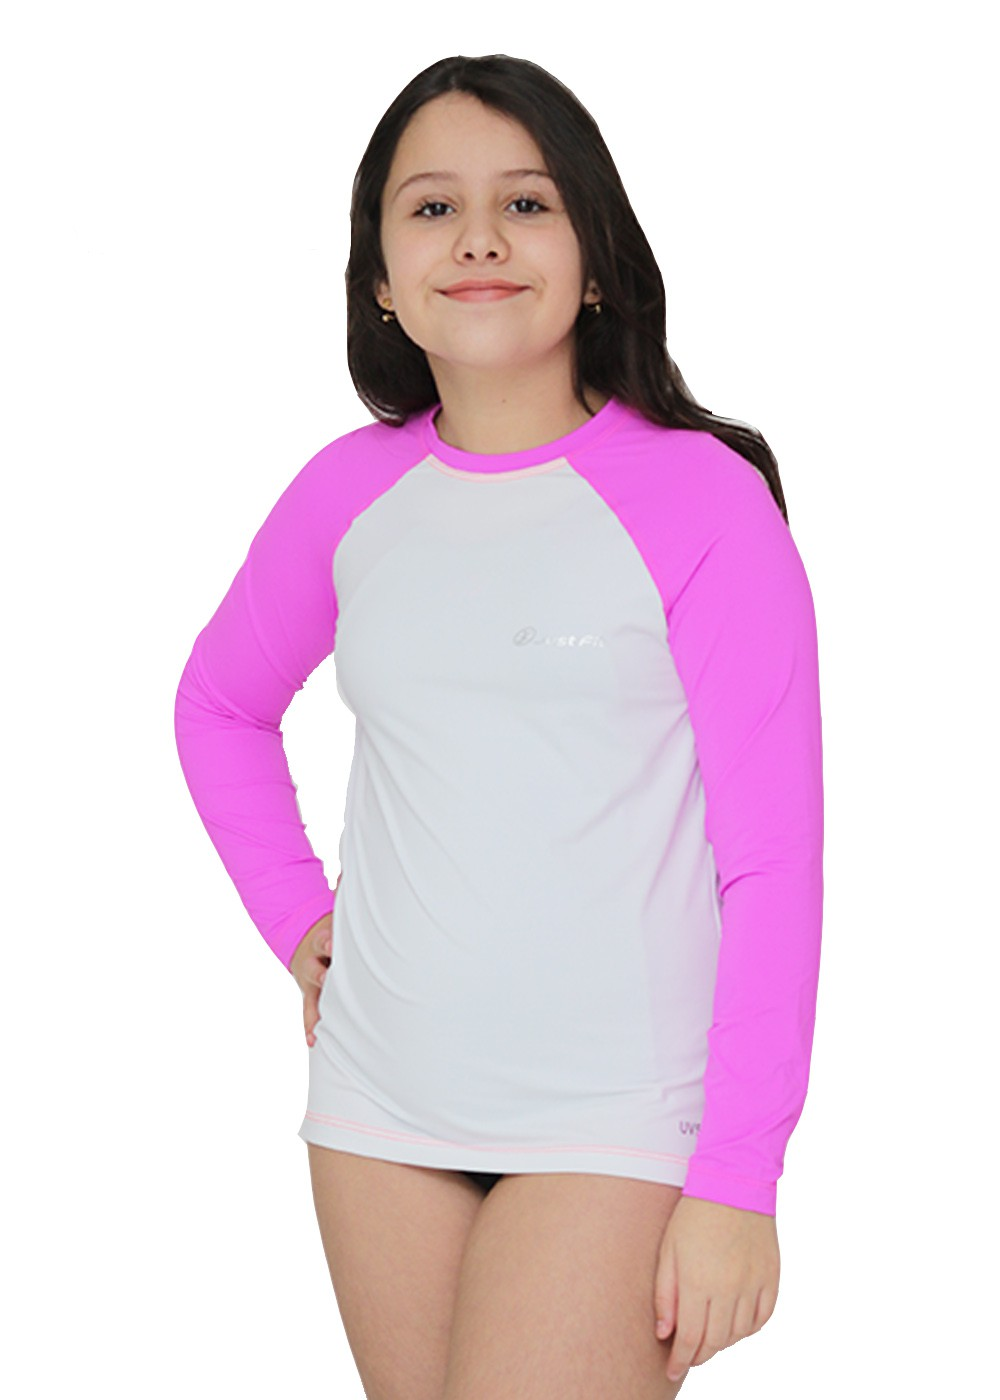 CAMISETA UV PROTECTION INFANTIL MANGA LONGA RAGLAN - BRANCO/PINK